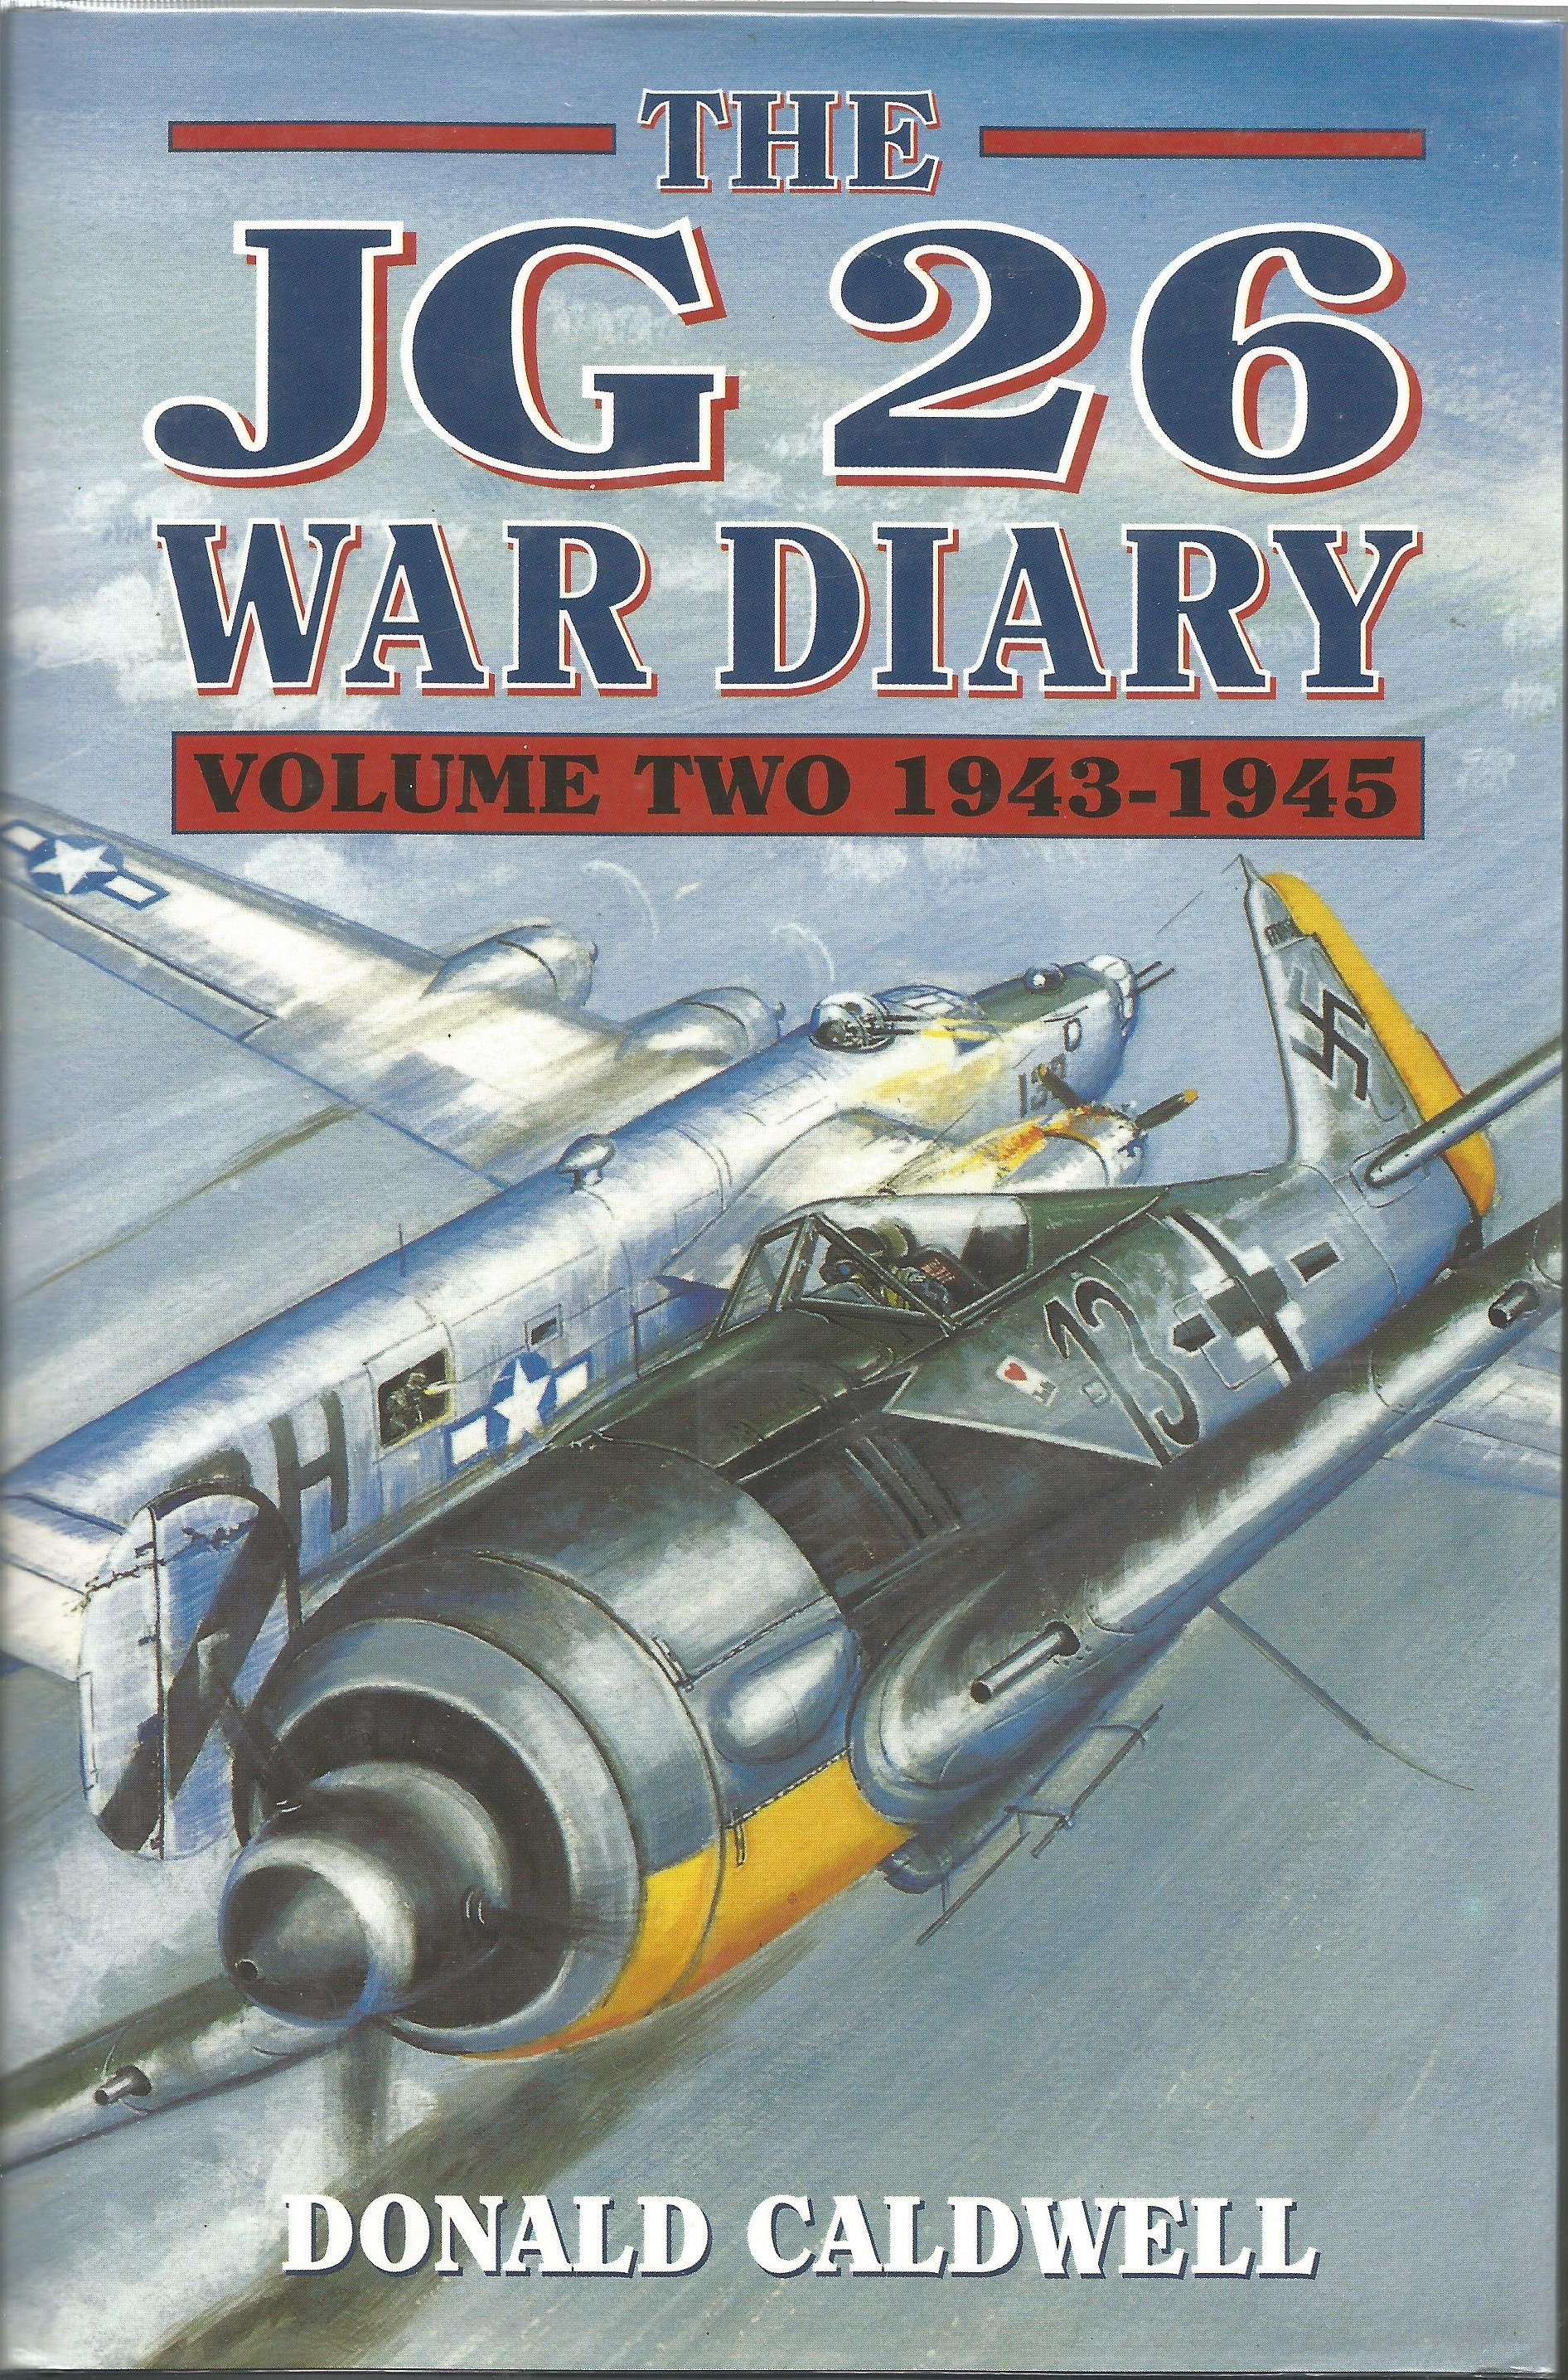 WW2 Luftwaffe ace signed JG 26 Vol II Hardback book by Caldwell, D 1998 Grub St. Signed bookplate by